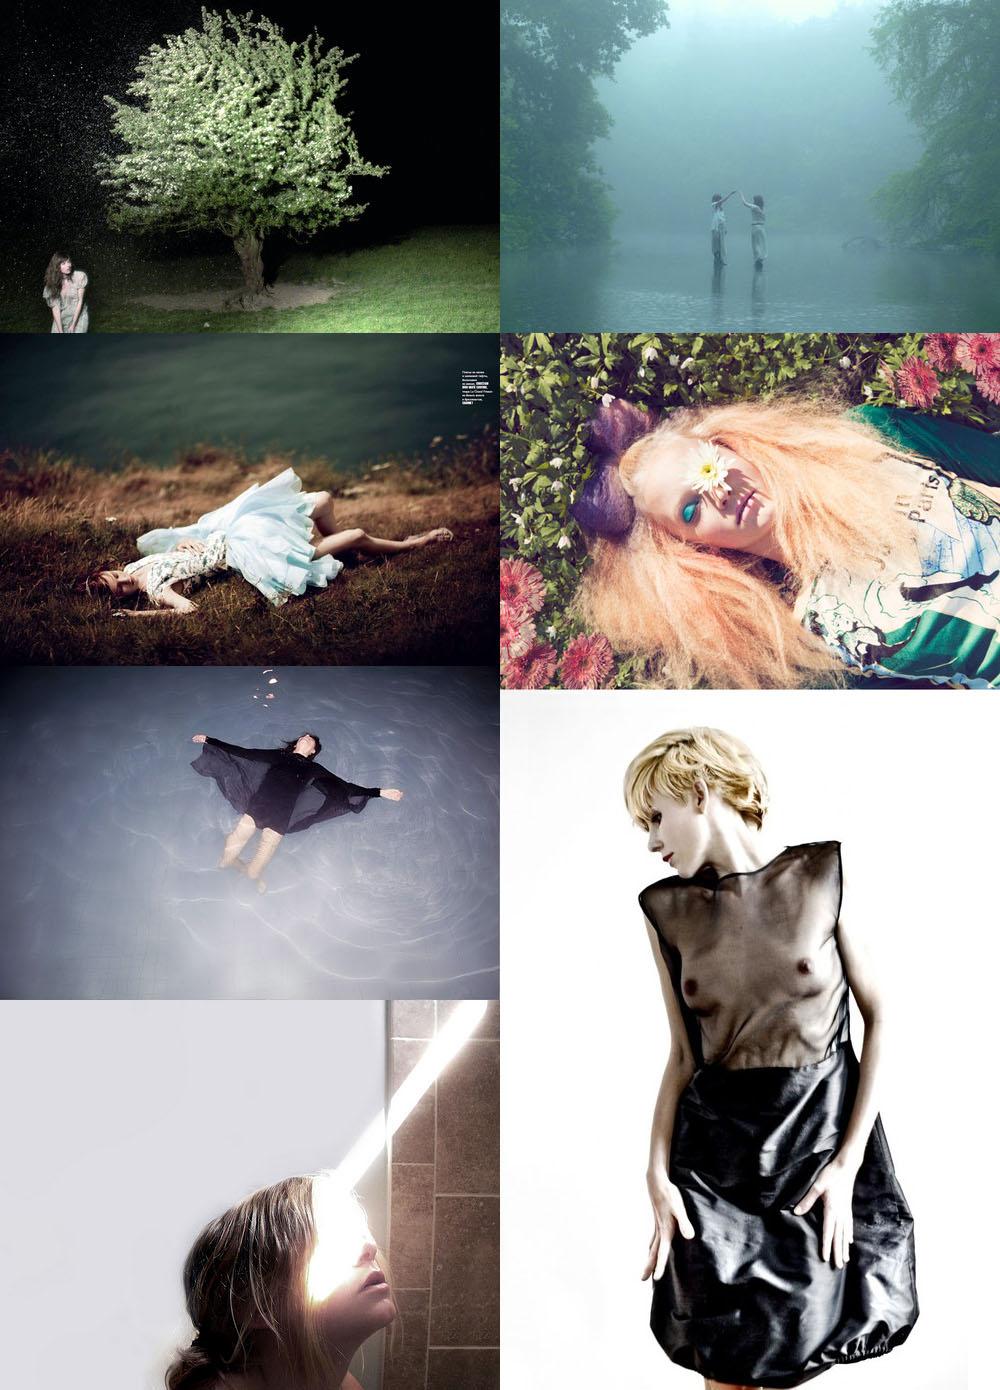 http://3.bp.blogspot.com/_twYmnhXVfP4/TMb6atvcW9I/AAAAAAAALmU/JrmrSMG1BbA/s1600/dailyinspiration.jpg